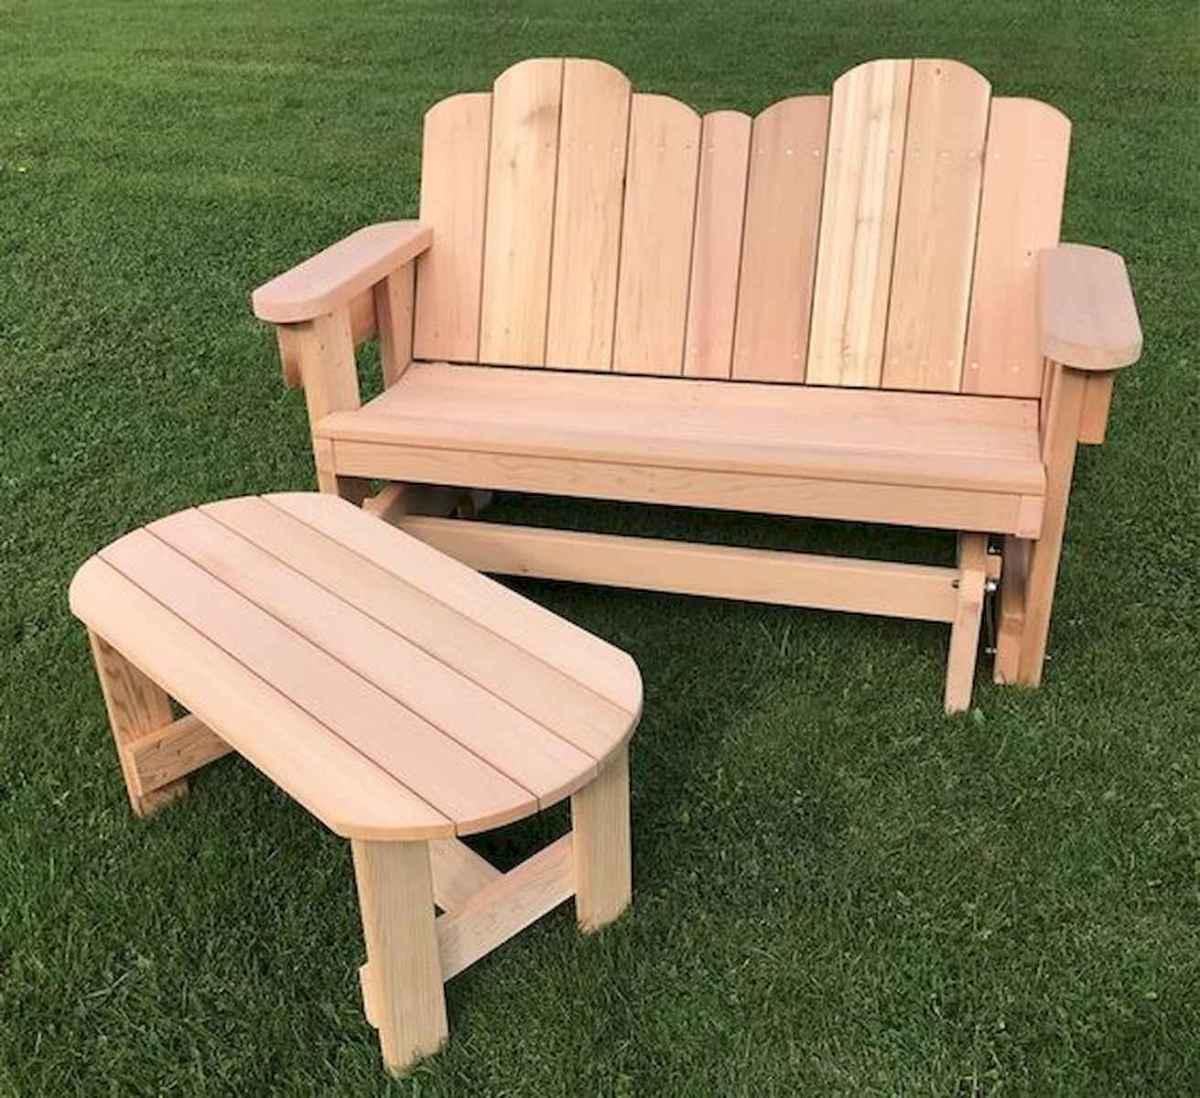 60 Amazing DIY Projects Otdoors Furniture Design Ideas (7)